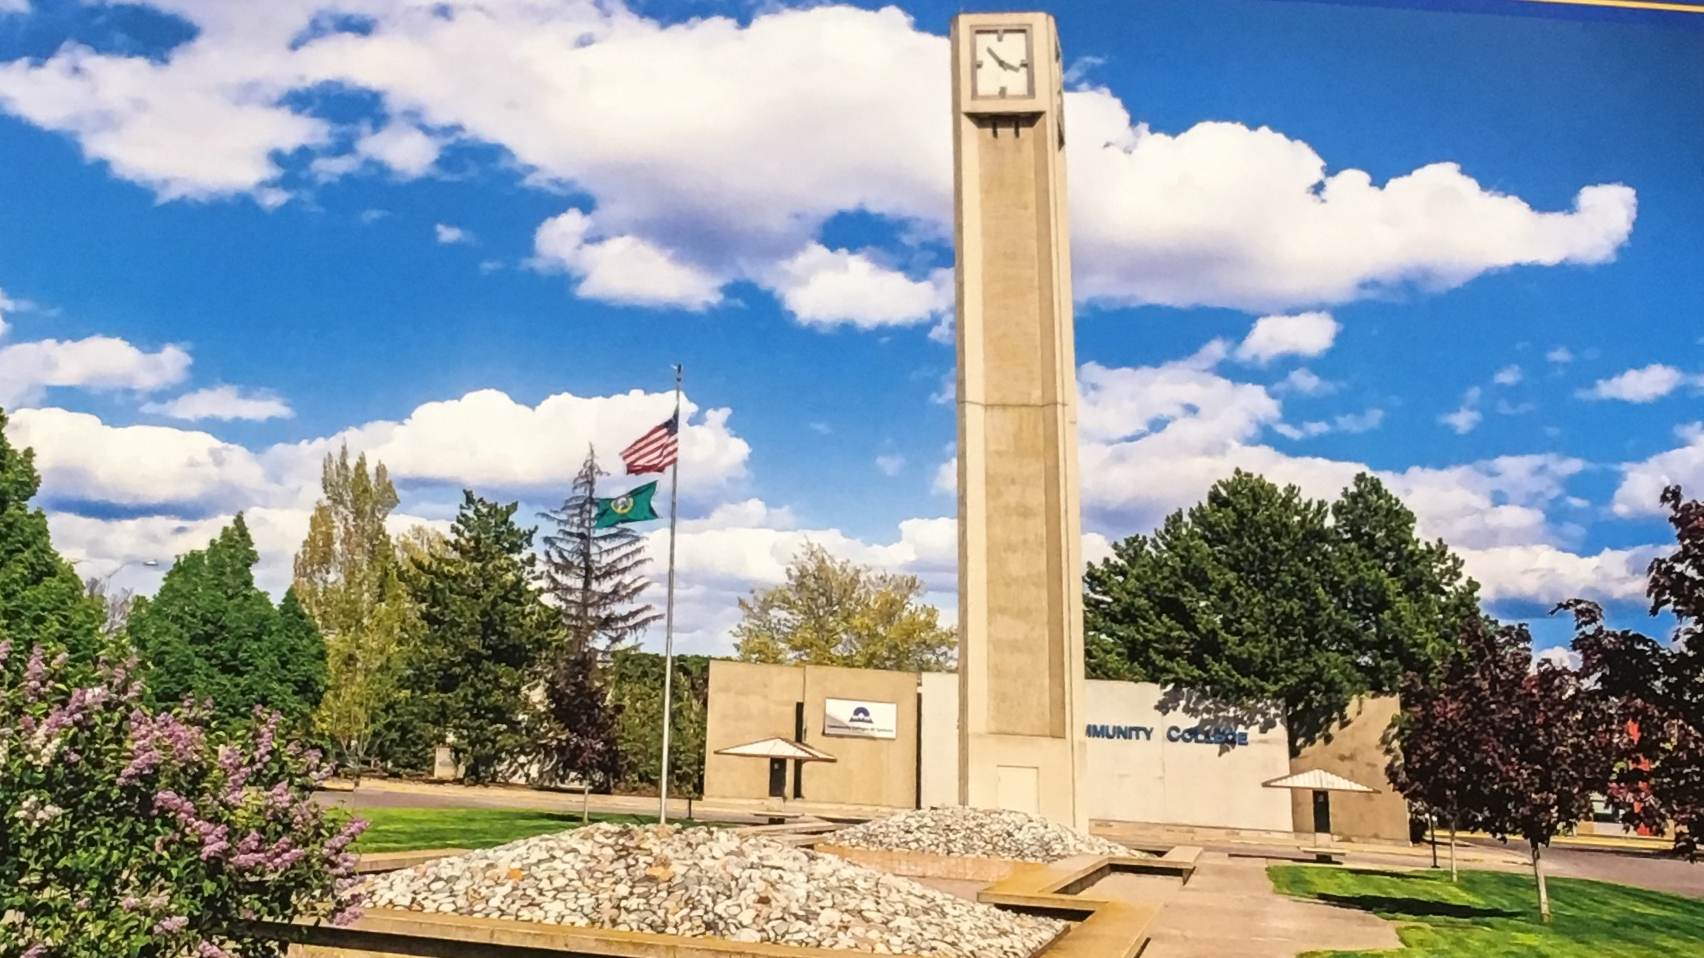 Spokane Community College App